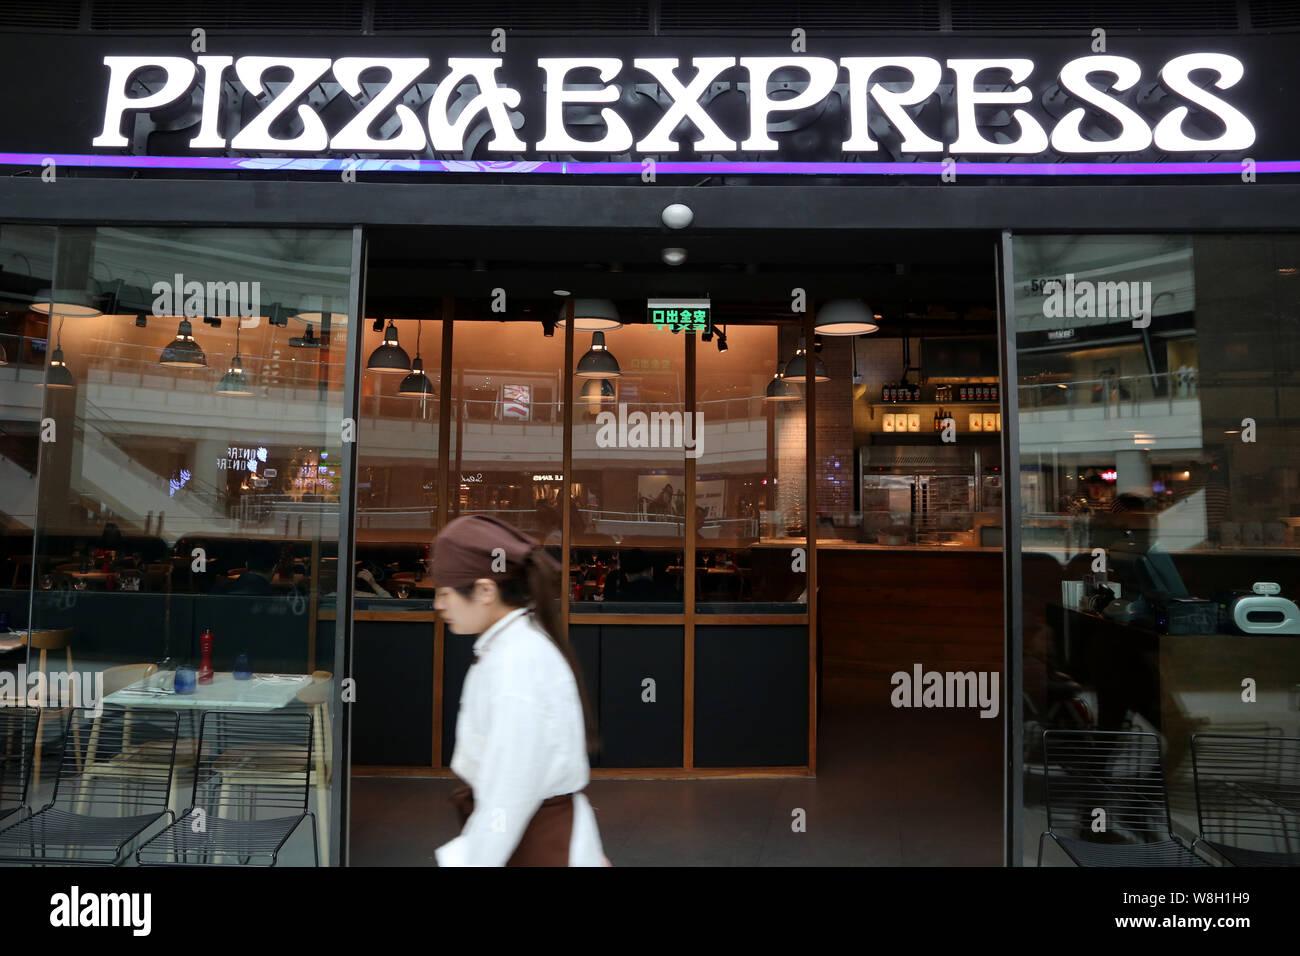 Pizzaexpress Stock Photos Pizzaexpress Stock Images Alamy